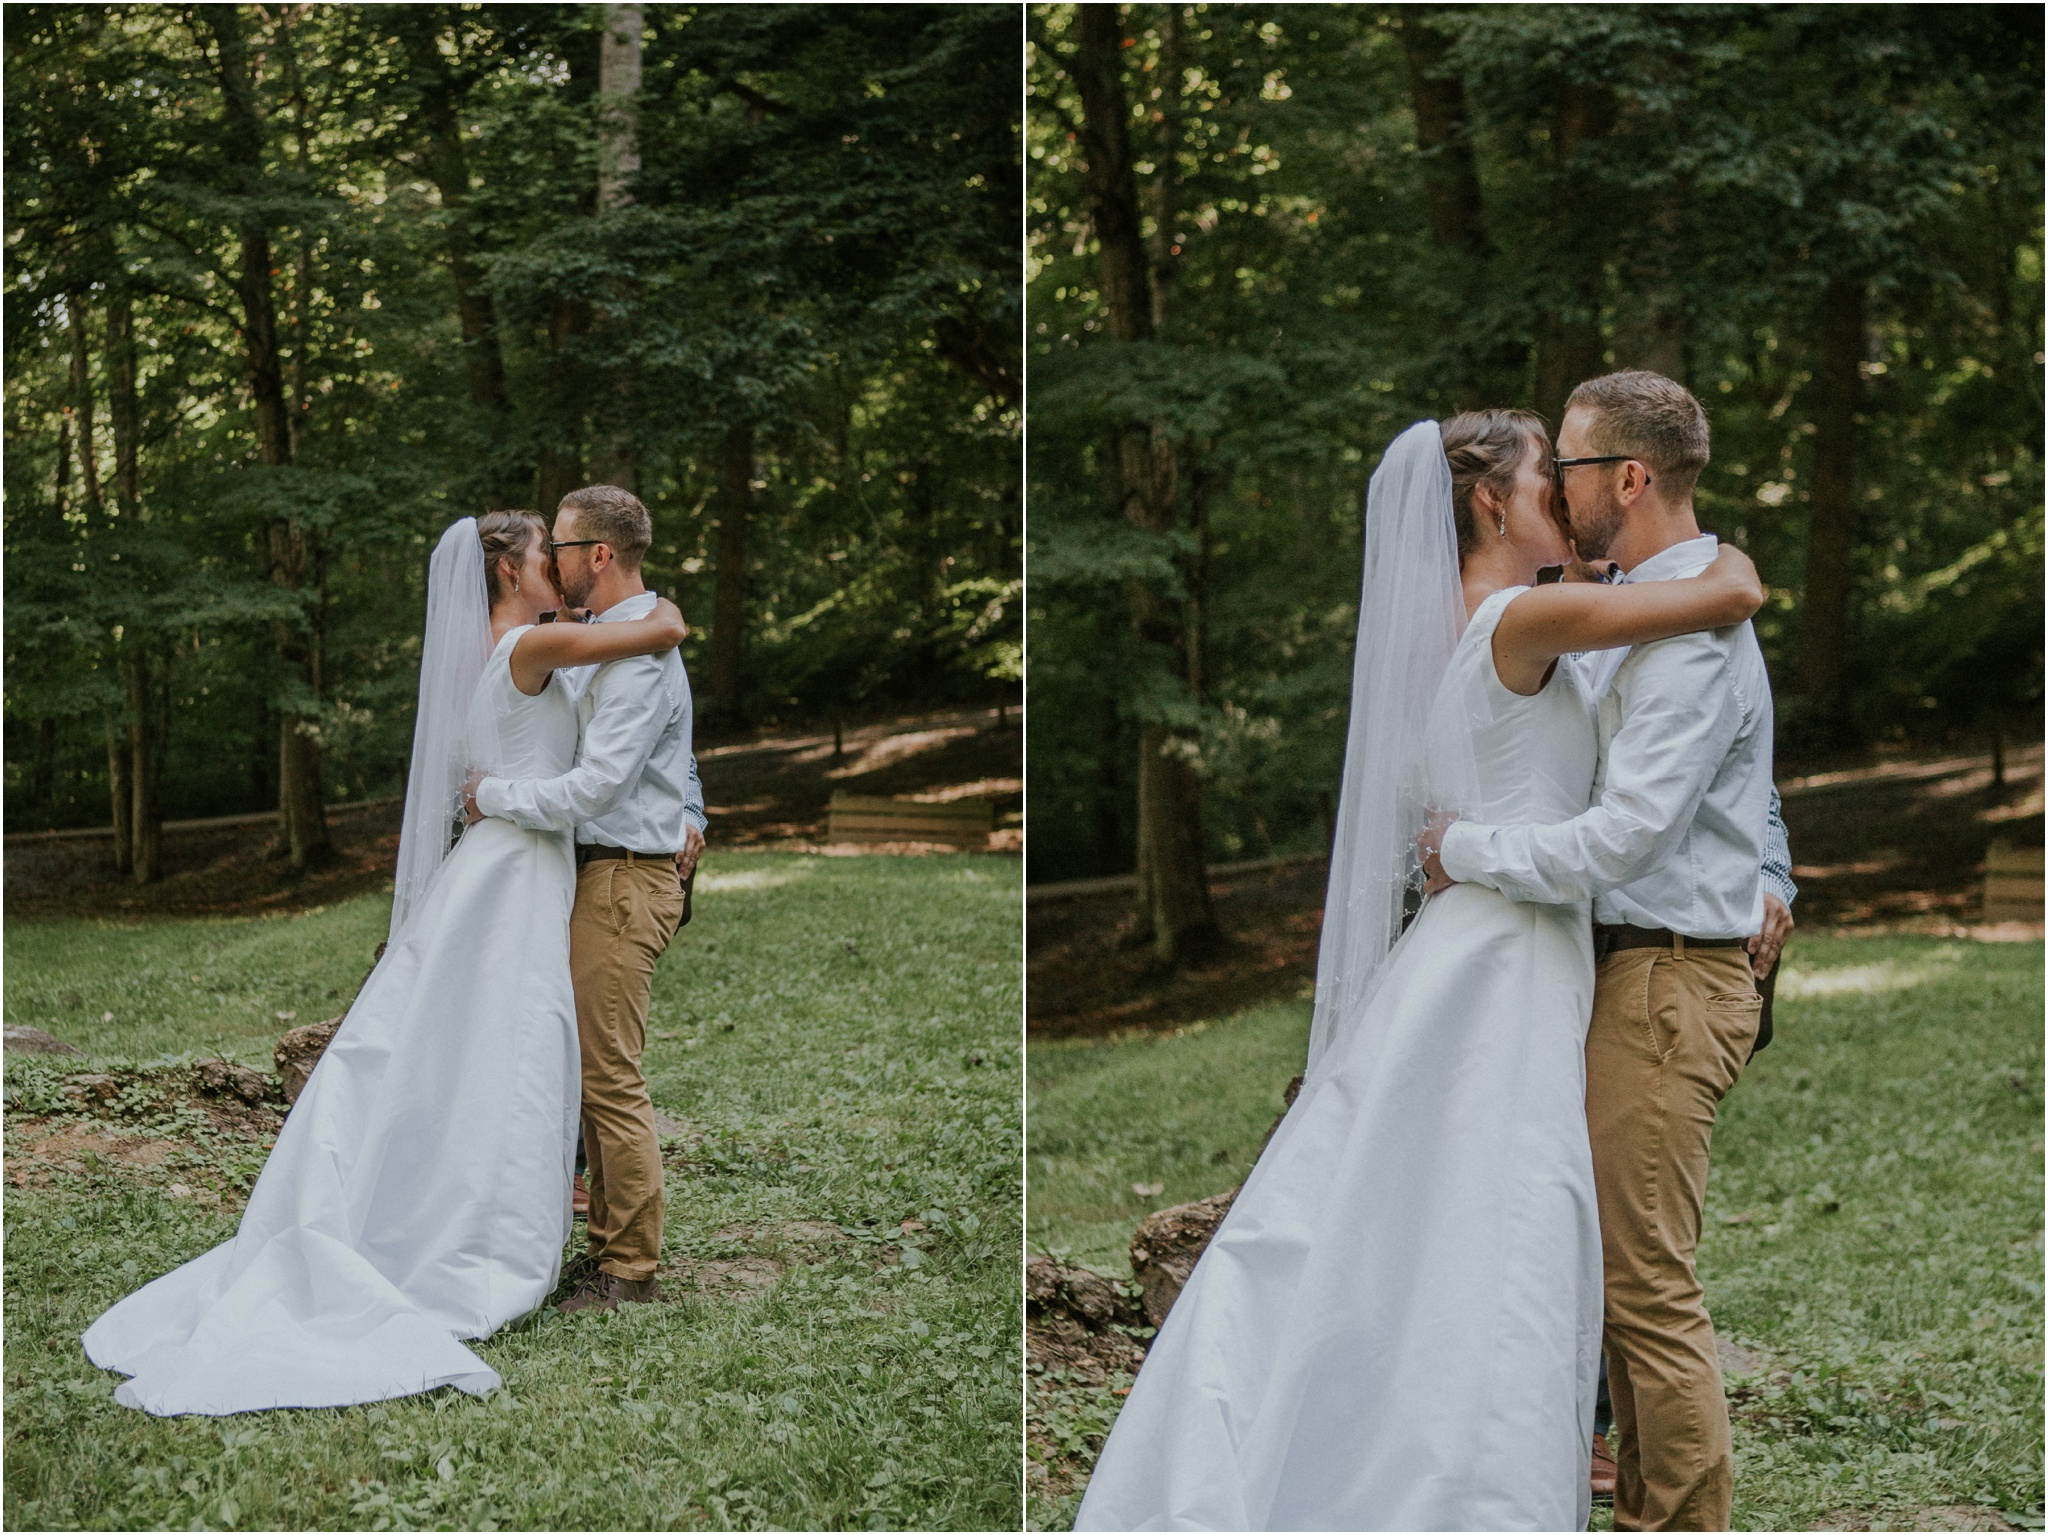 sugar-hollow-park-bristol-virginia-wedding-intimate-woodsy-black-forest-ceremony-adventurous-couple_0030.jpg